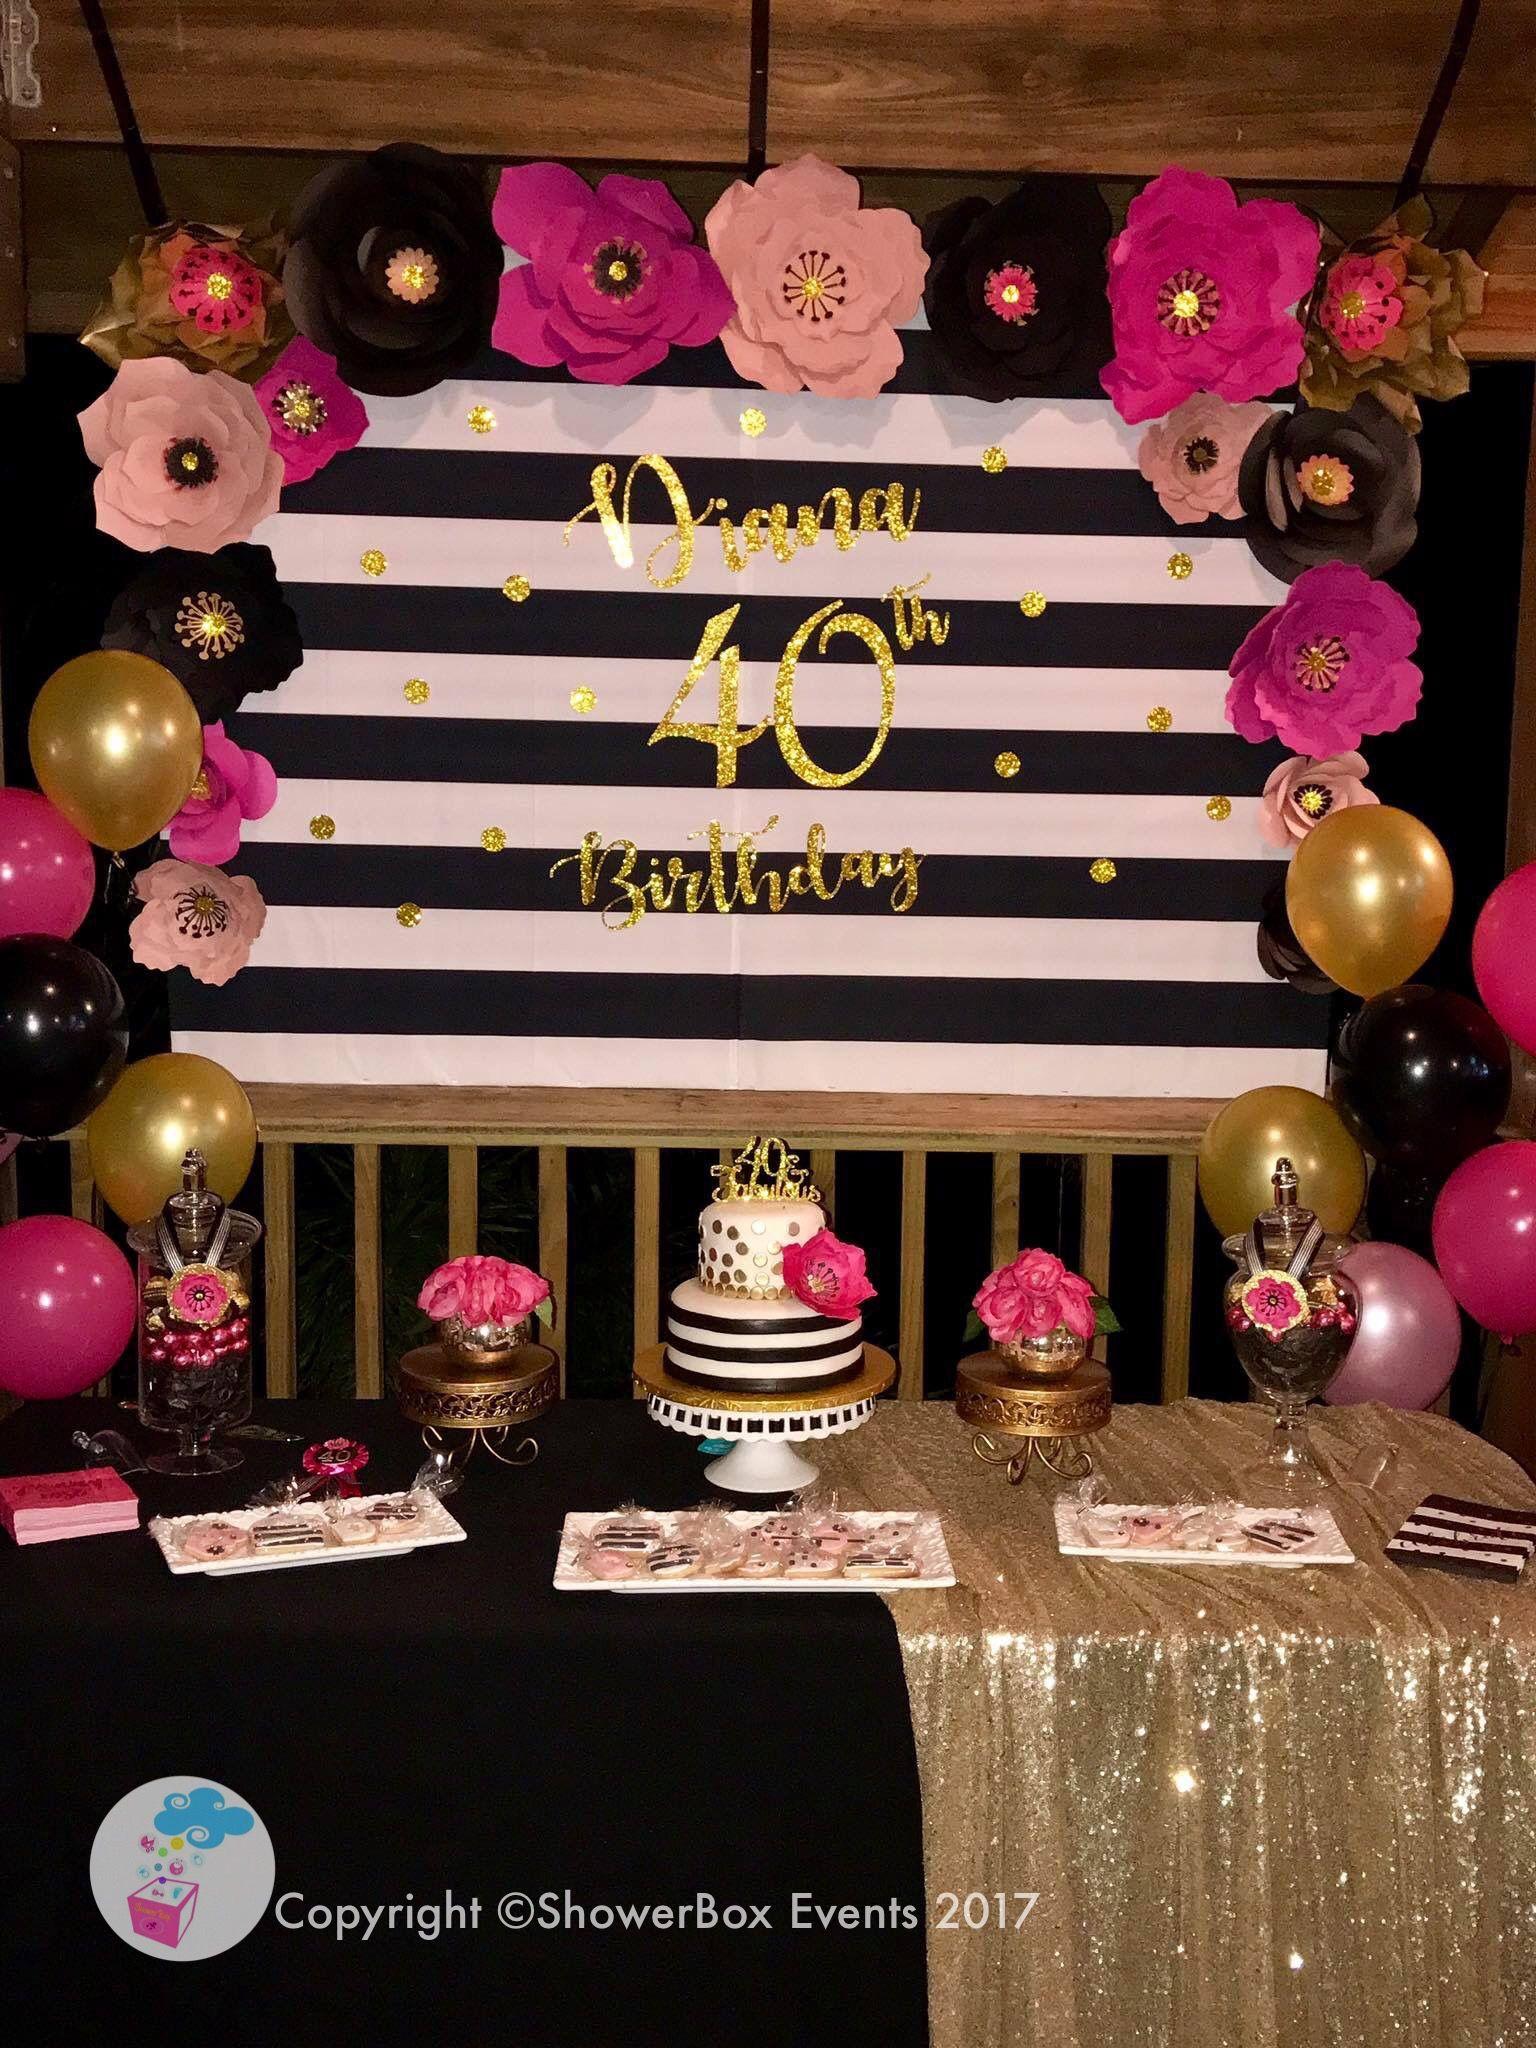 40th Birthday Showerbox Events 2017 Like Us On Fb Myshowerbox